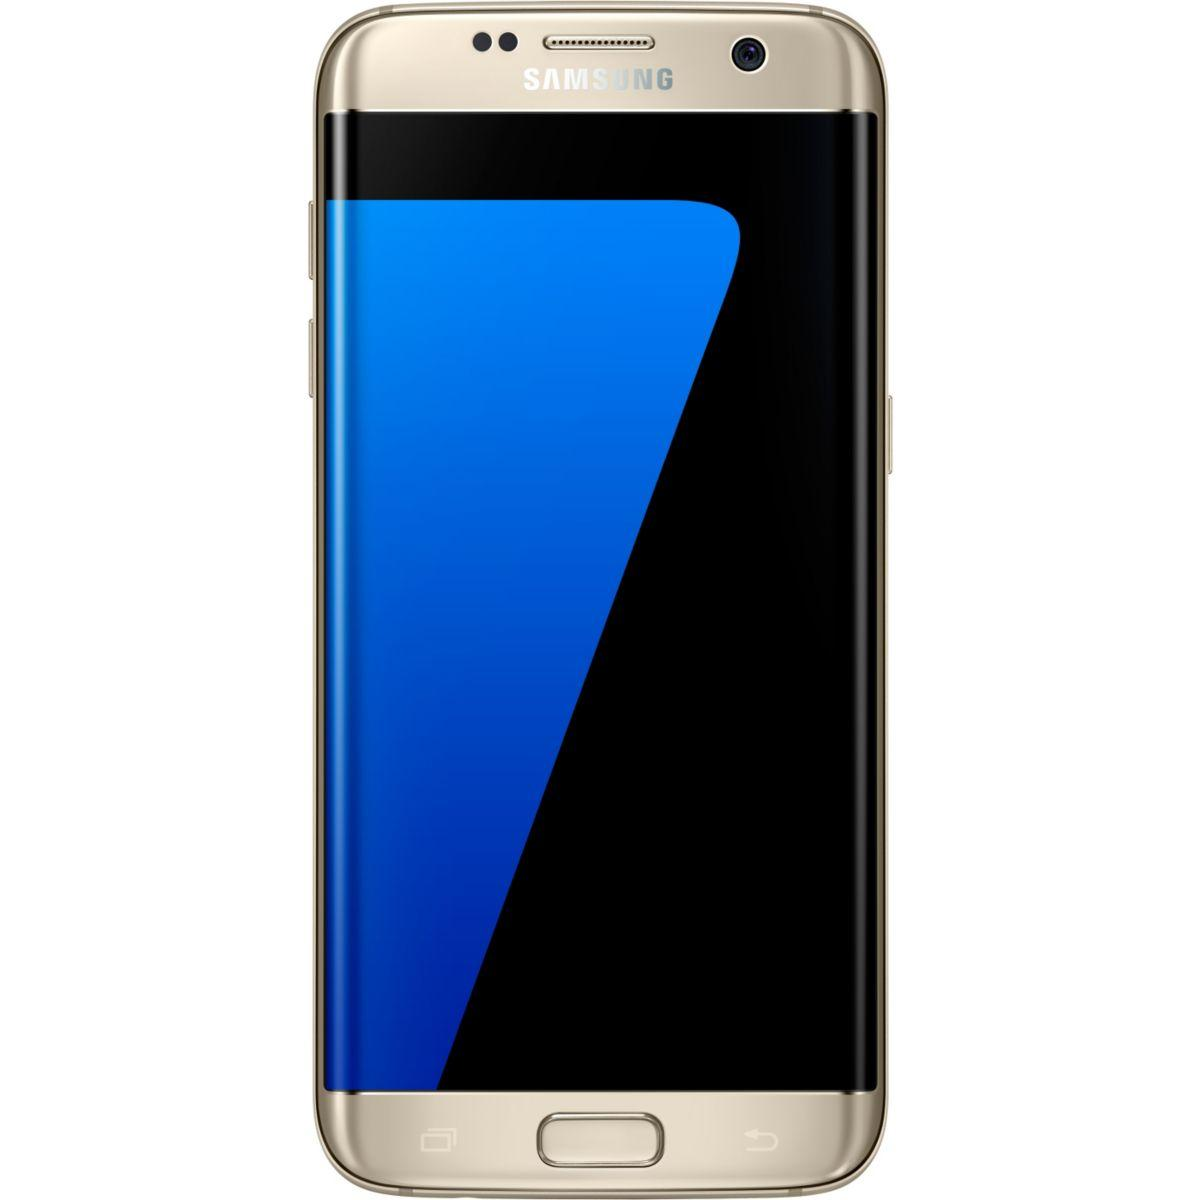 Pack promo smartphone samsung galaxy s7 edge or 32 go + etui samsung view cover led galaxy s7 edge gold - soldes et bonnes affaires à prix imbattables